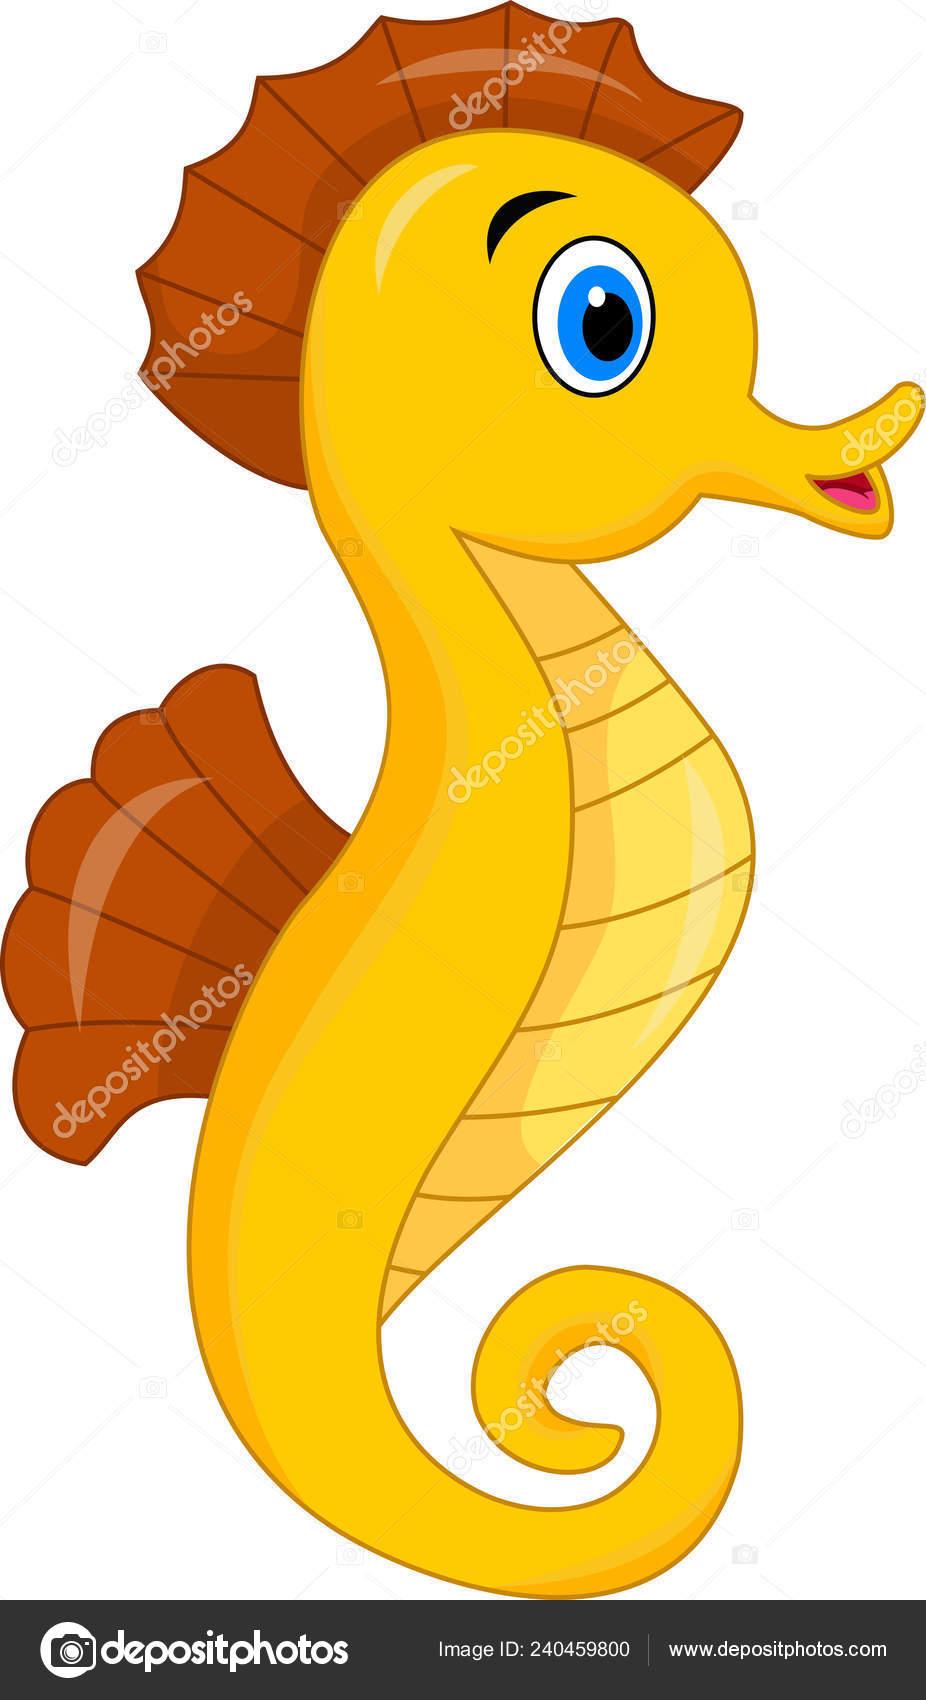 Vector Illustration Cute Seahorse Cartoon Stock Vector C Ciputra 240459800